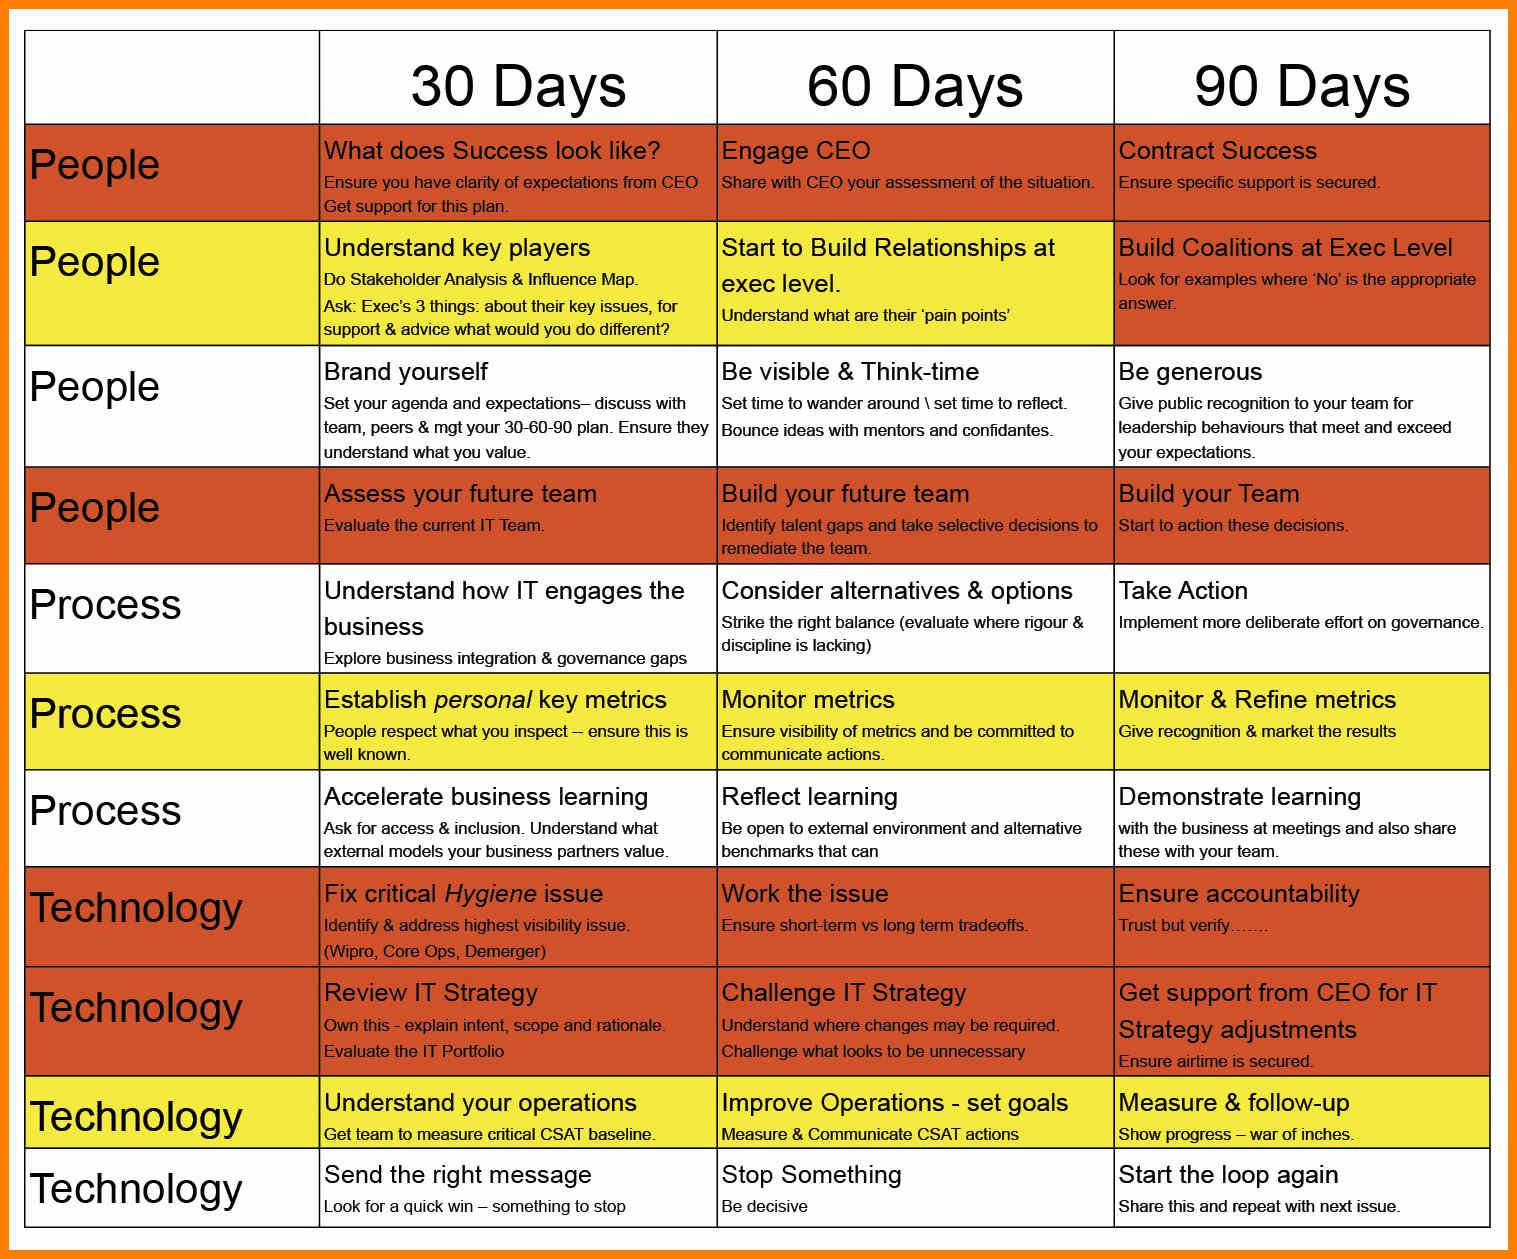 10 Stylish New Career Ideas At 30 018 day work plan days new job marketing google search career